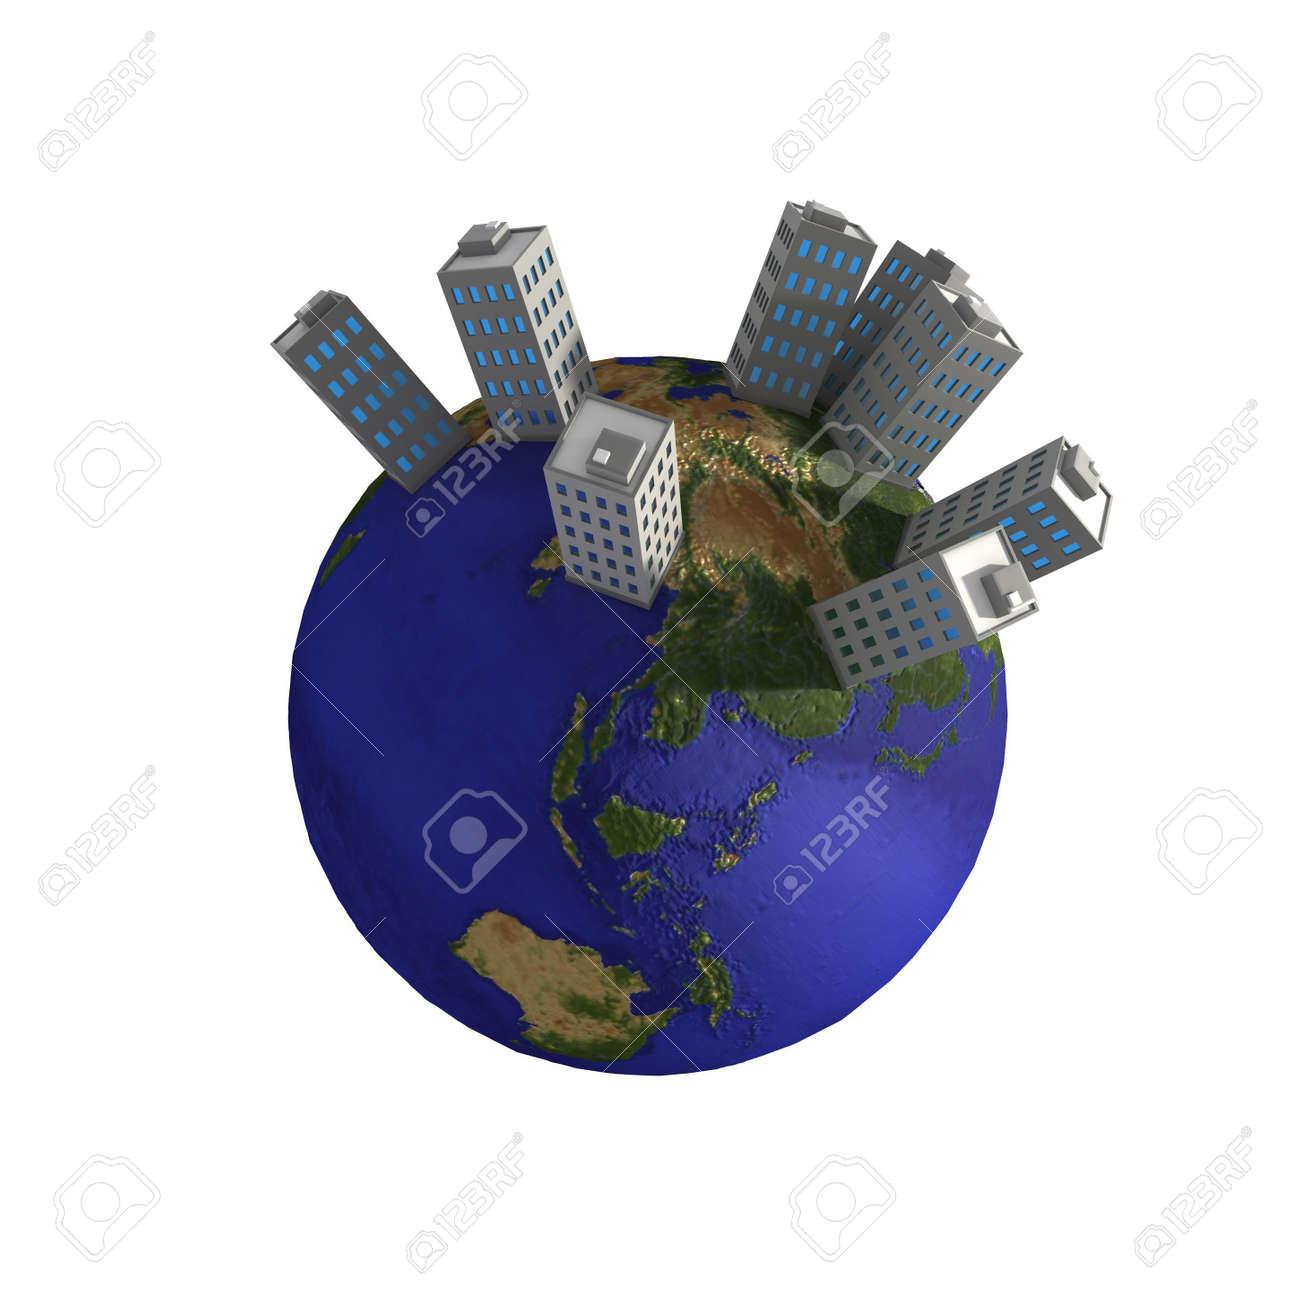 3d globe with cartoon buildings on top Stock Photo - 3320437